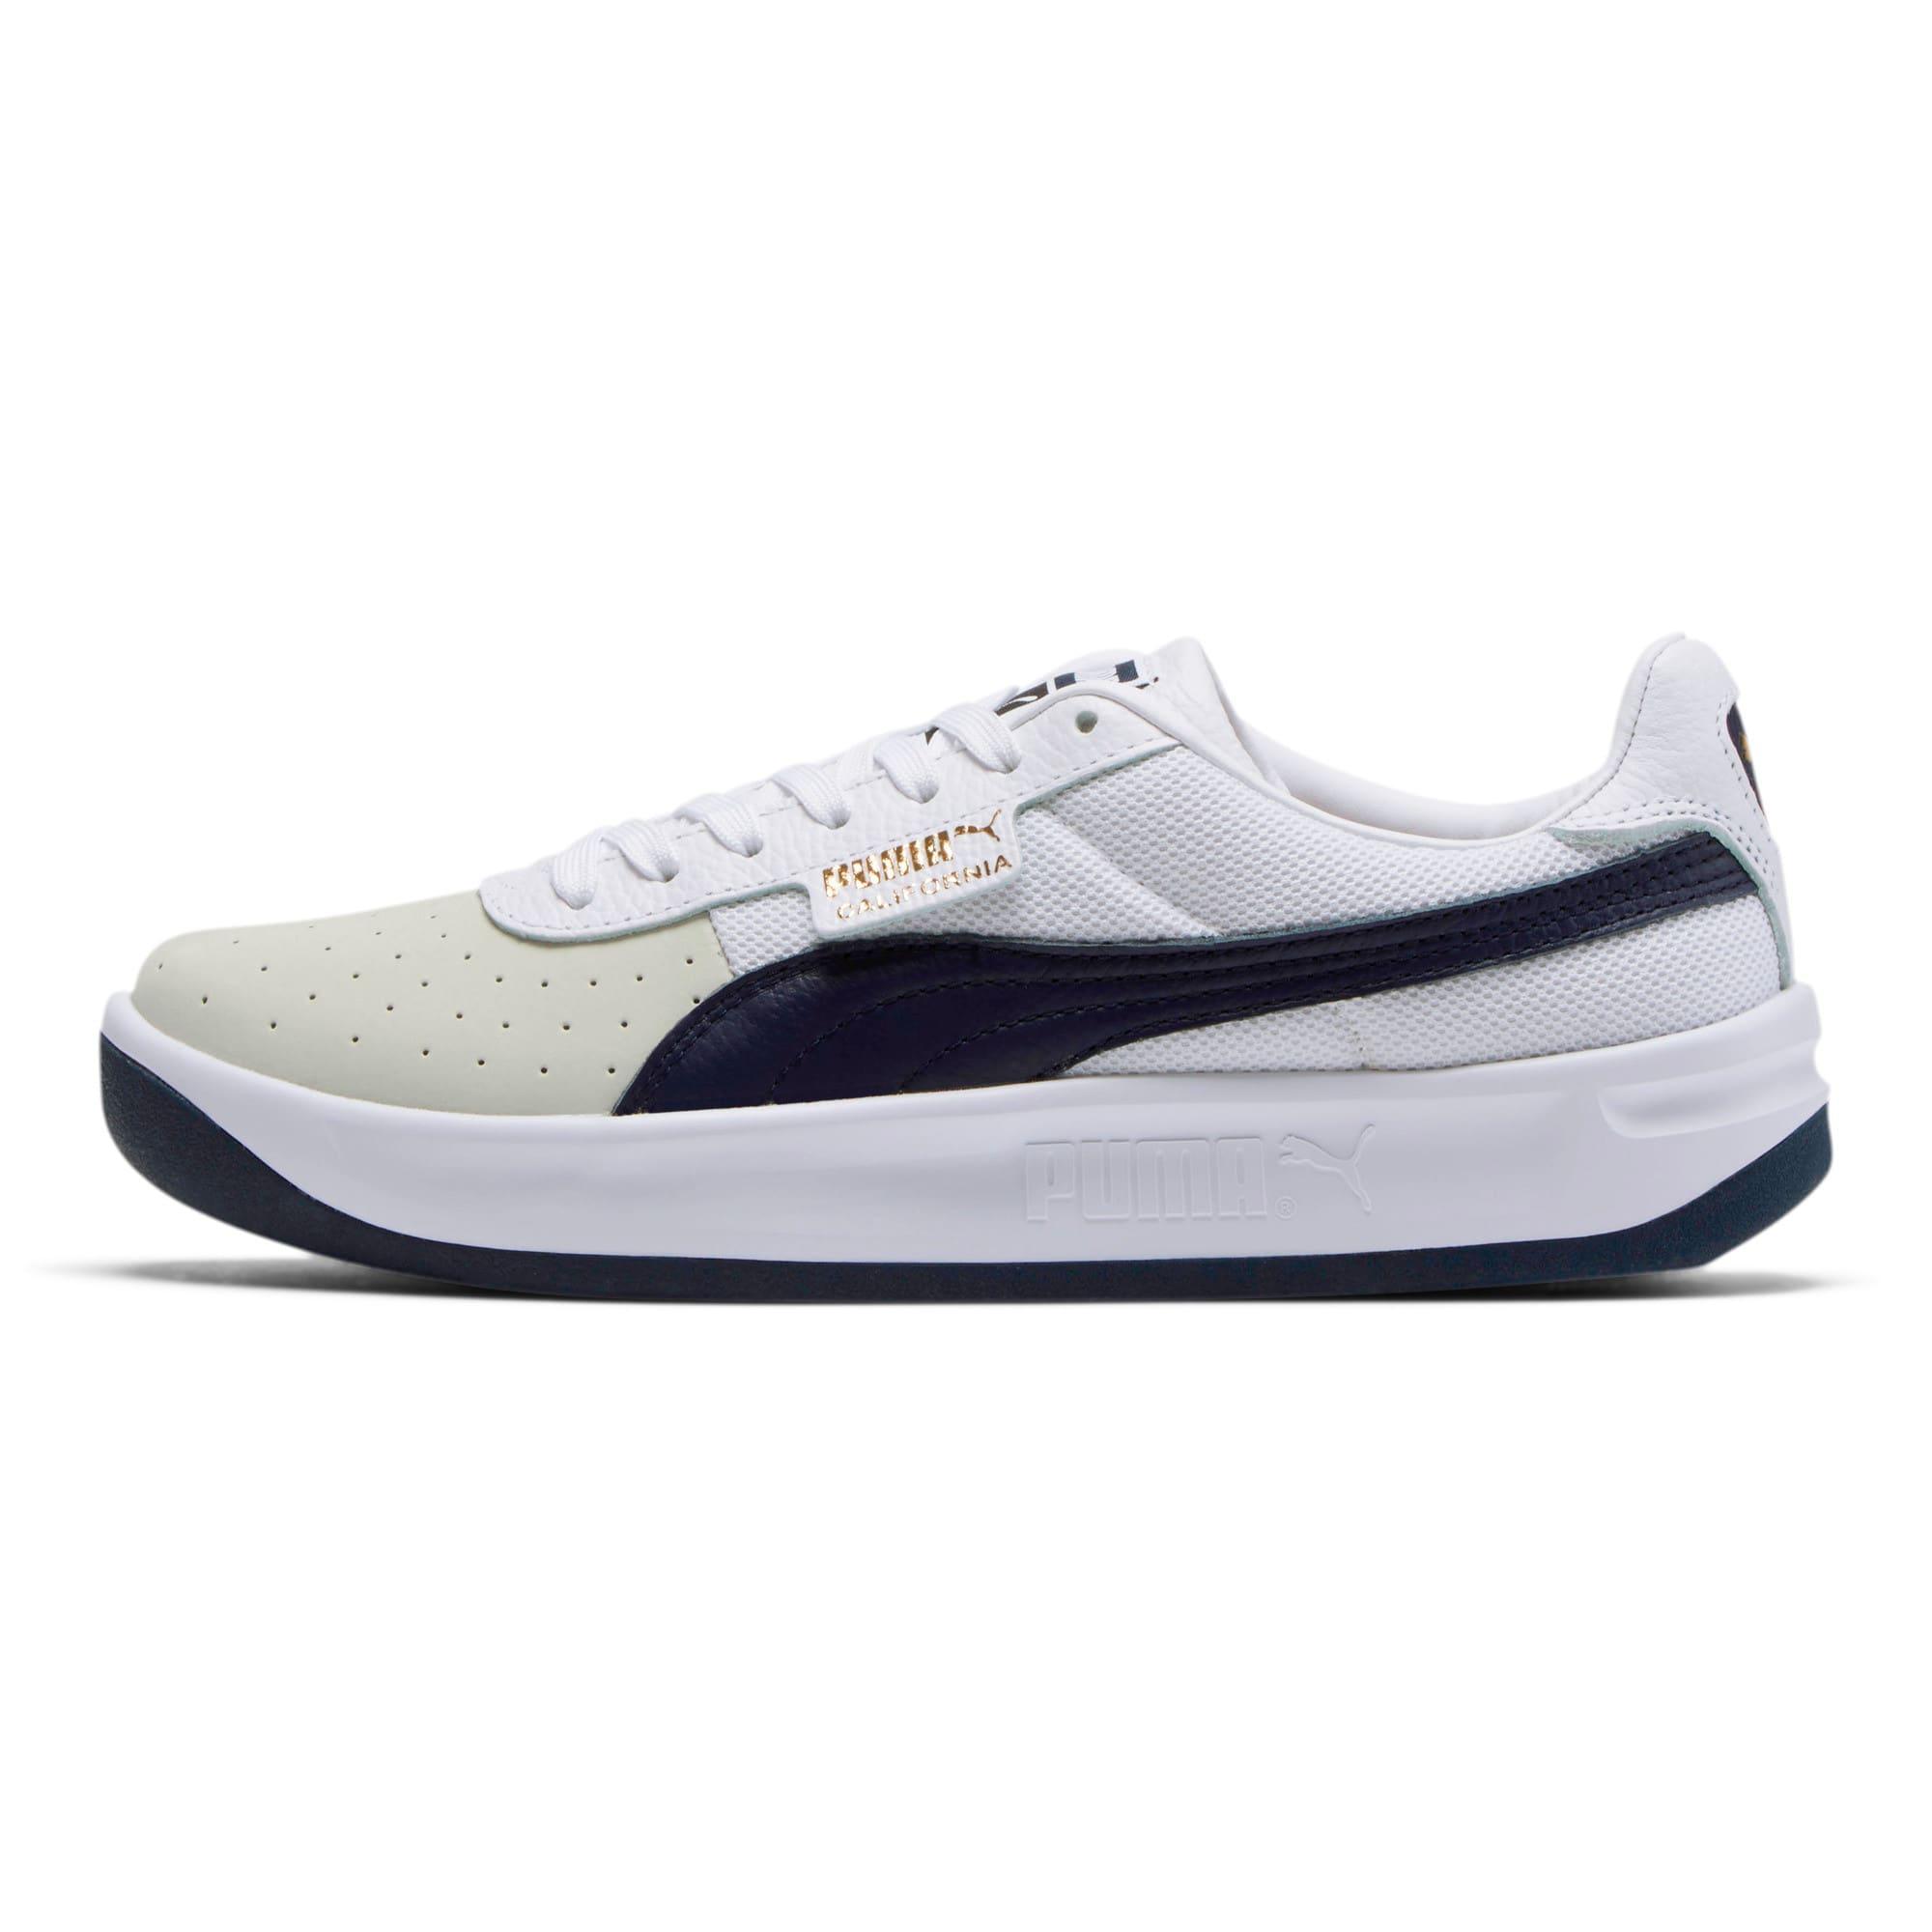 Thumbnail 1 of California Casual Sneakers, P White-Peacoat-P White, medium